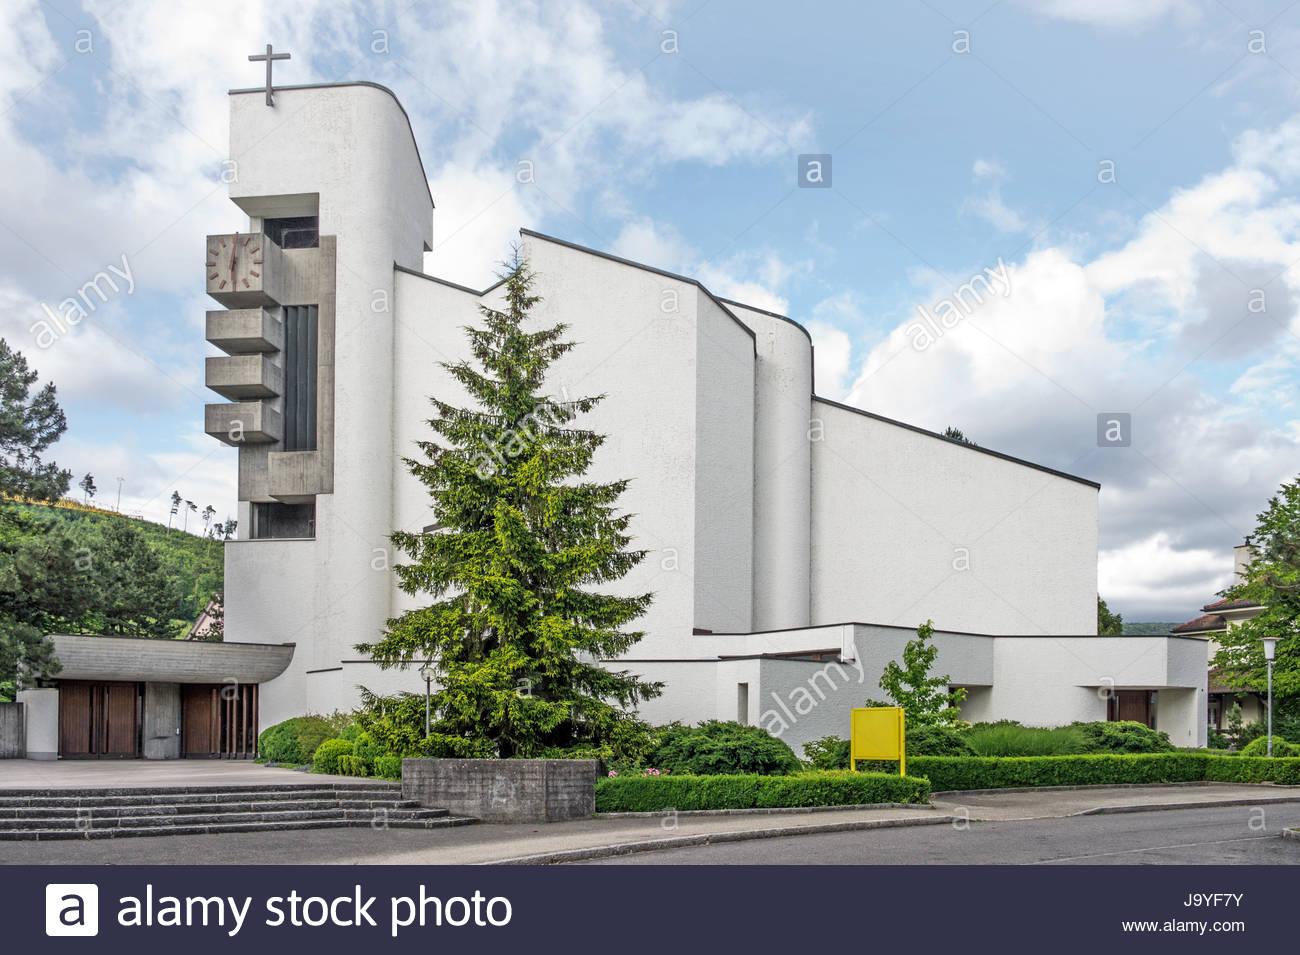 Kirche, modern, moderne, Baustil, Architektur, Architektur Stockfoto ...